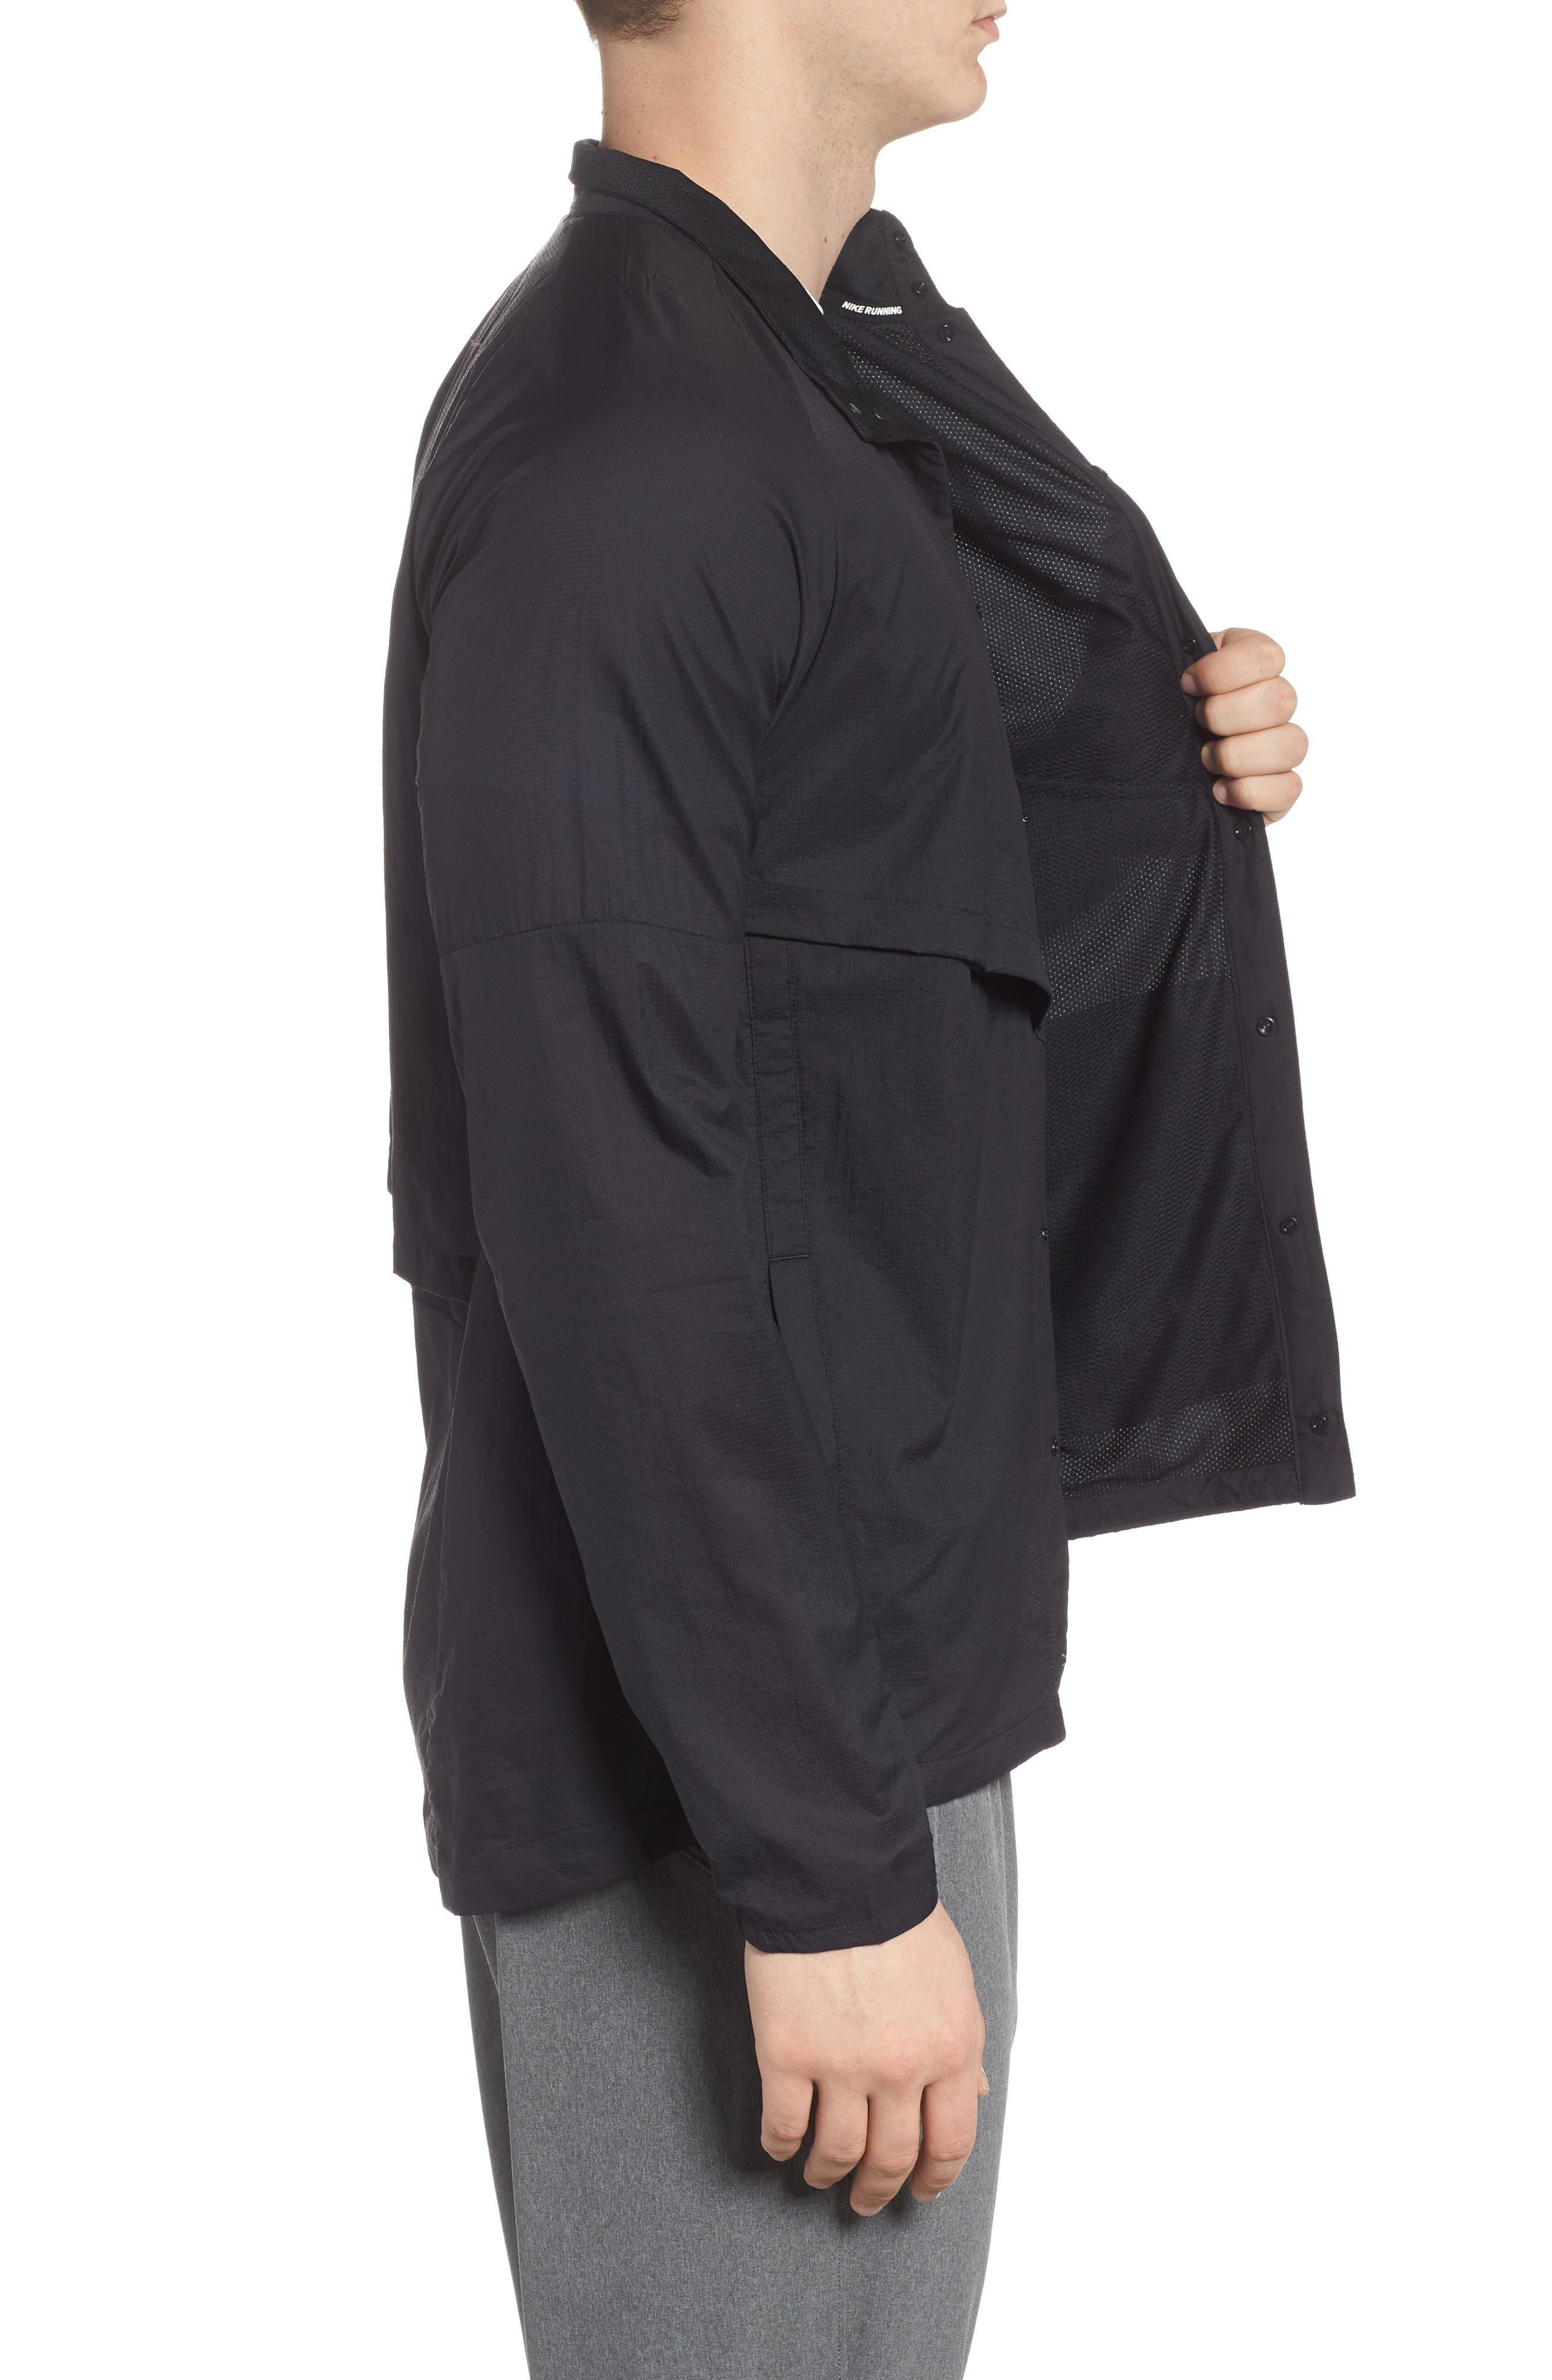 Run Division Jacket,                             Alternate thumbnail 3, color,                             BLACK